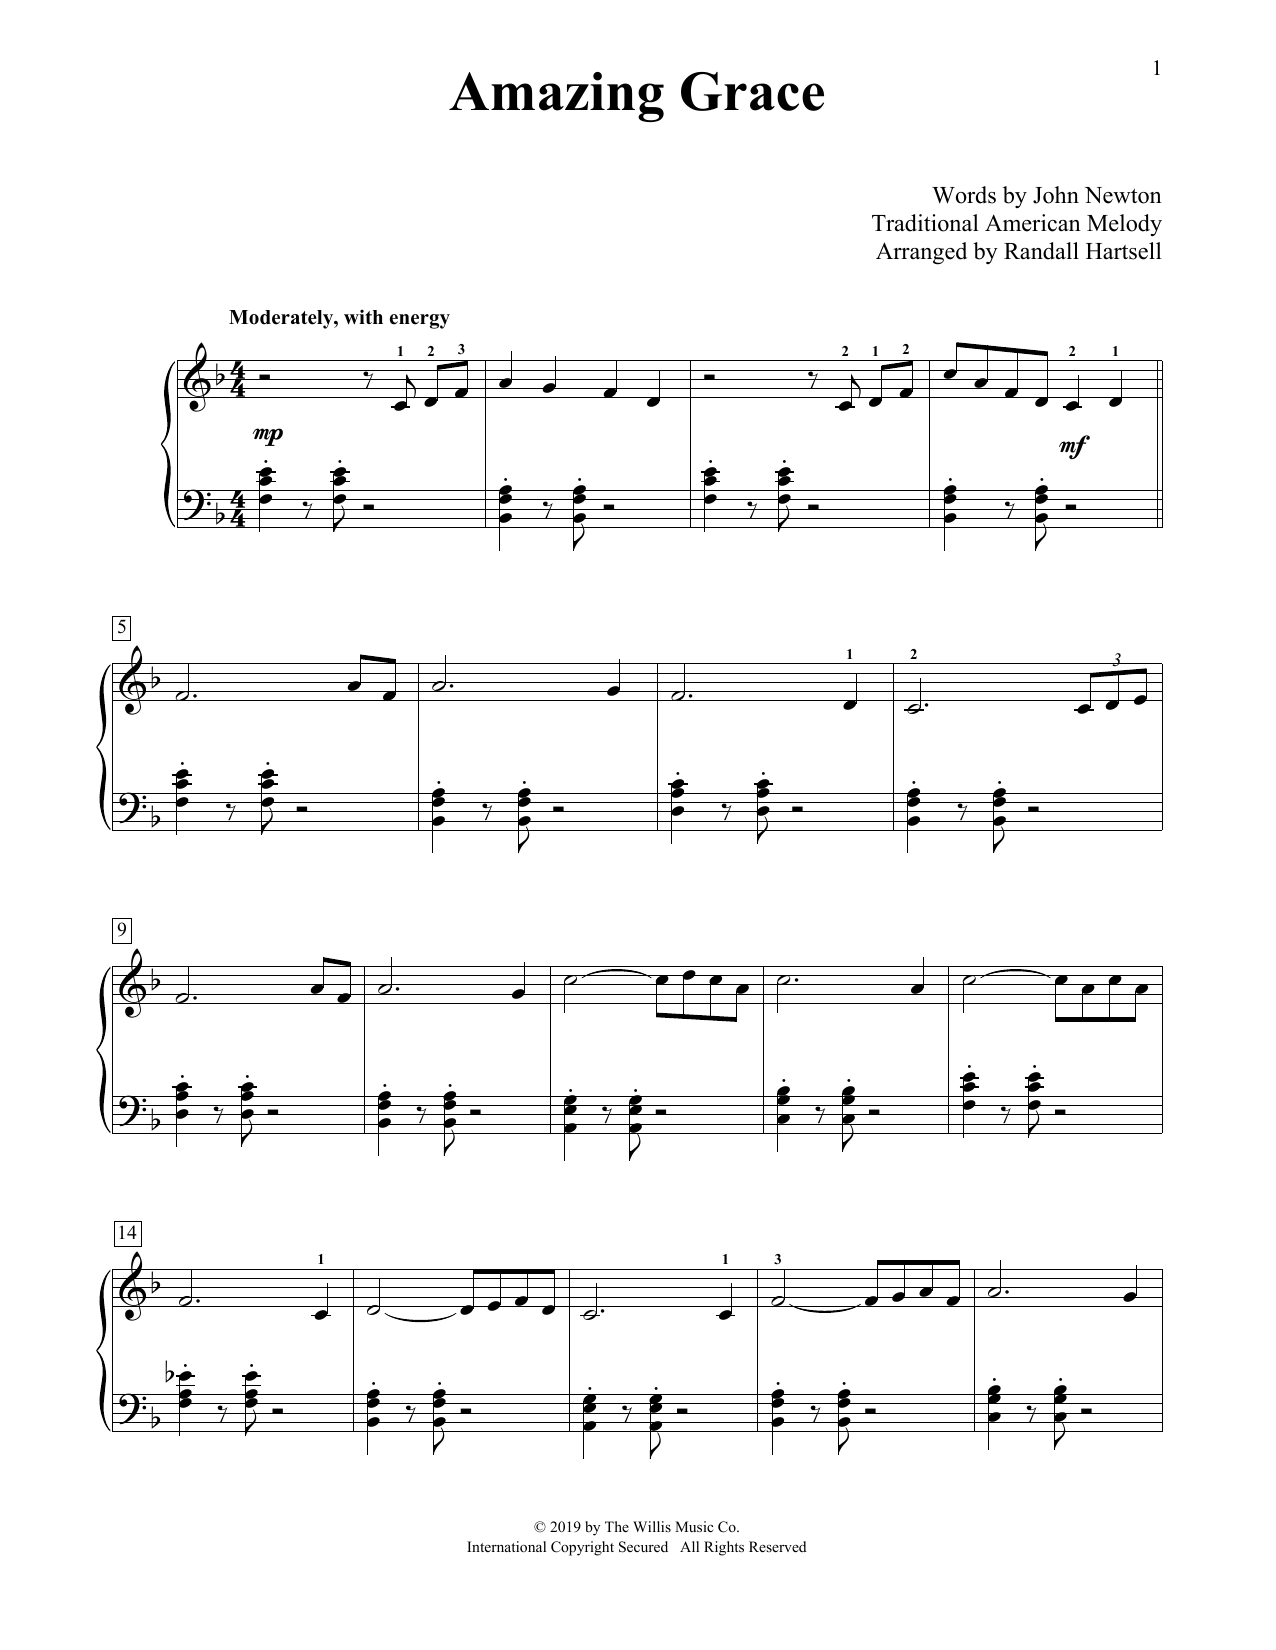 Amazing Grace (arr. Randall Hartsell) (Educational Piano)